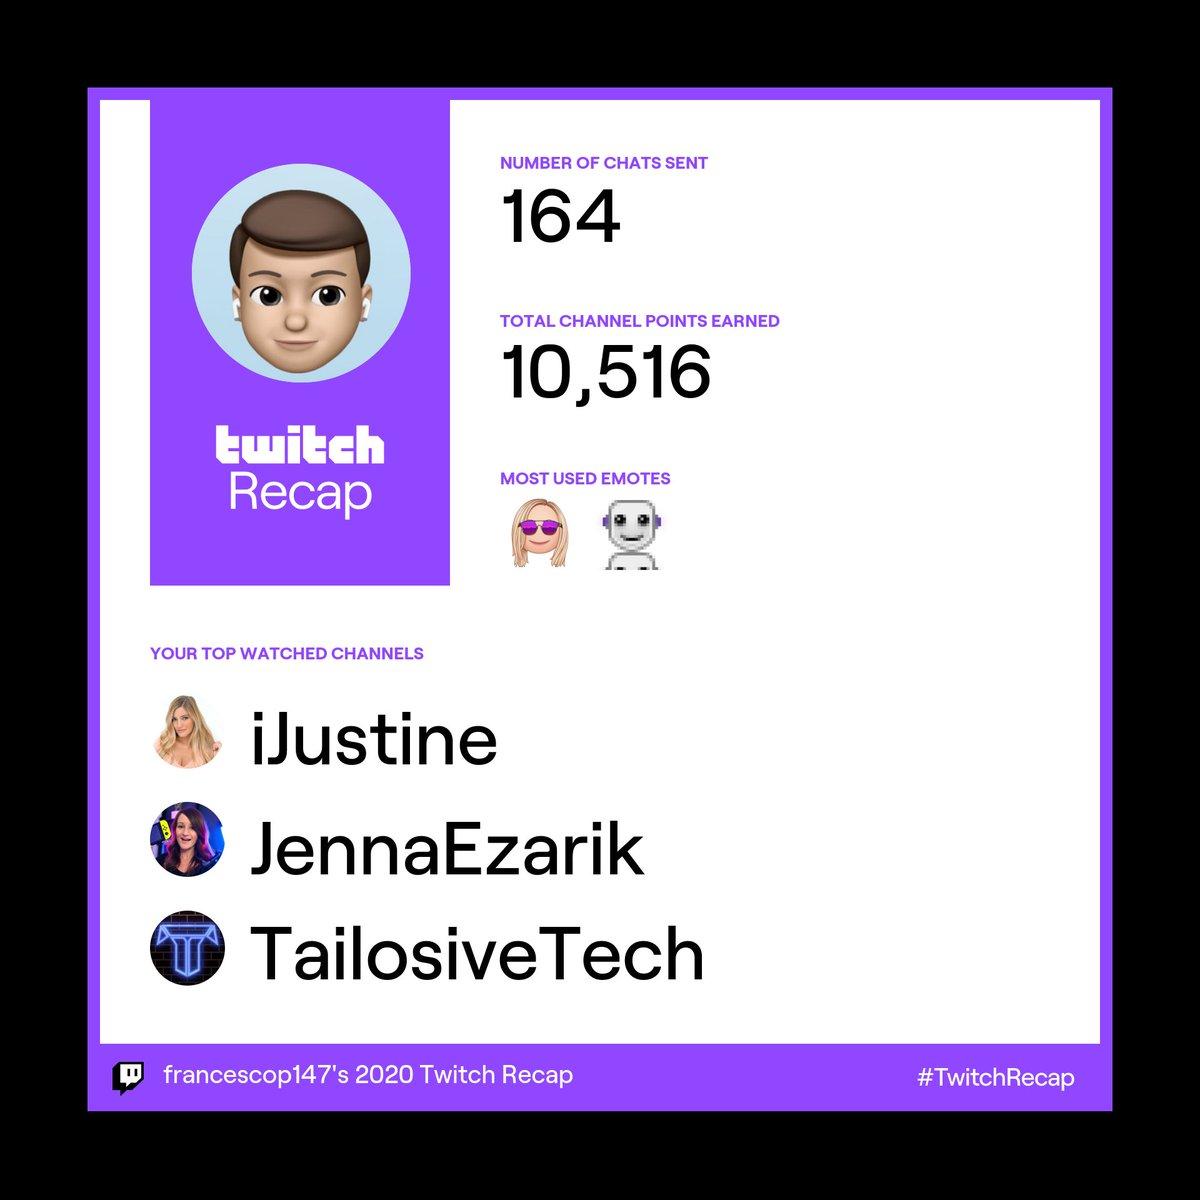 Here's my #TwitchRecap for 2020. Keep up the great work @ijustine, @jennaezarik, & @TailosiveTech!